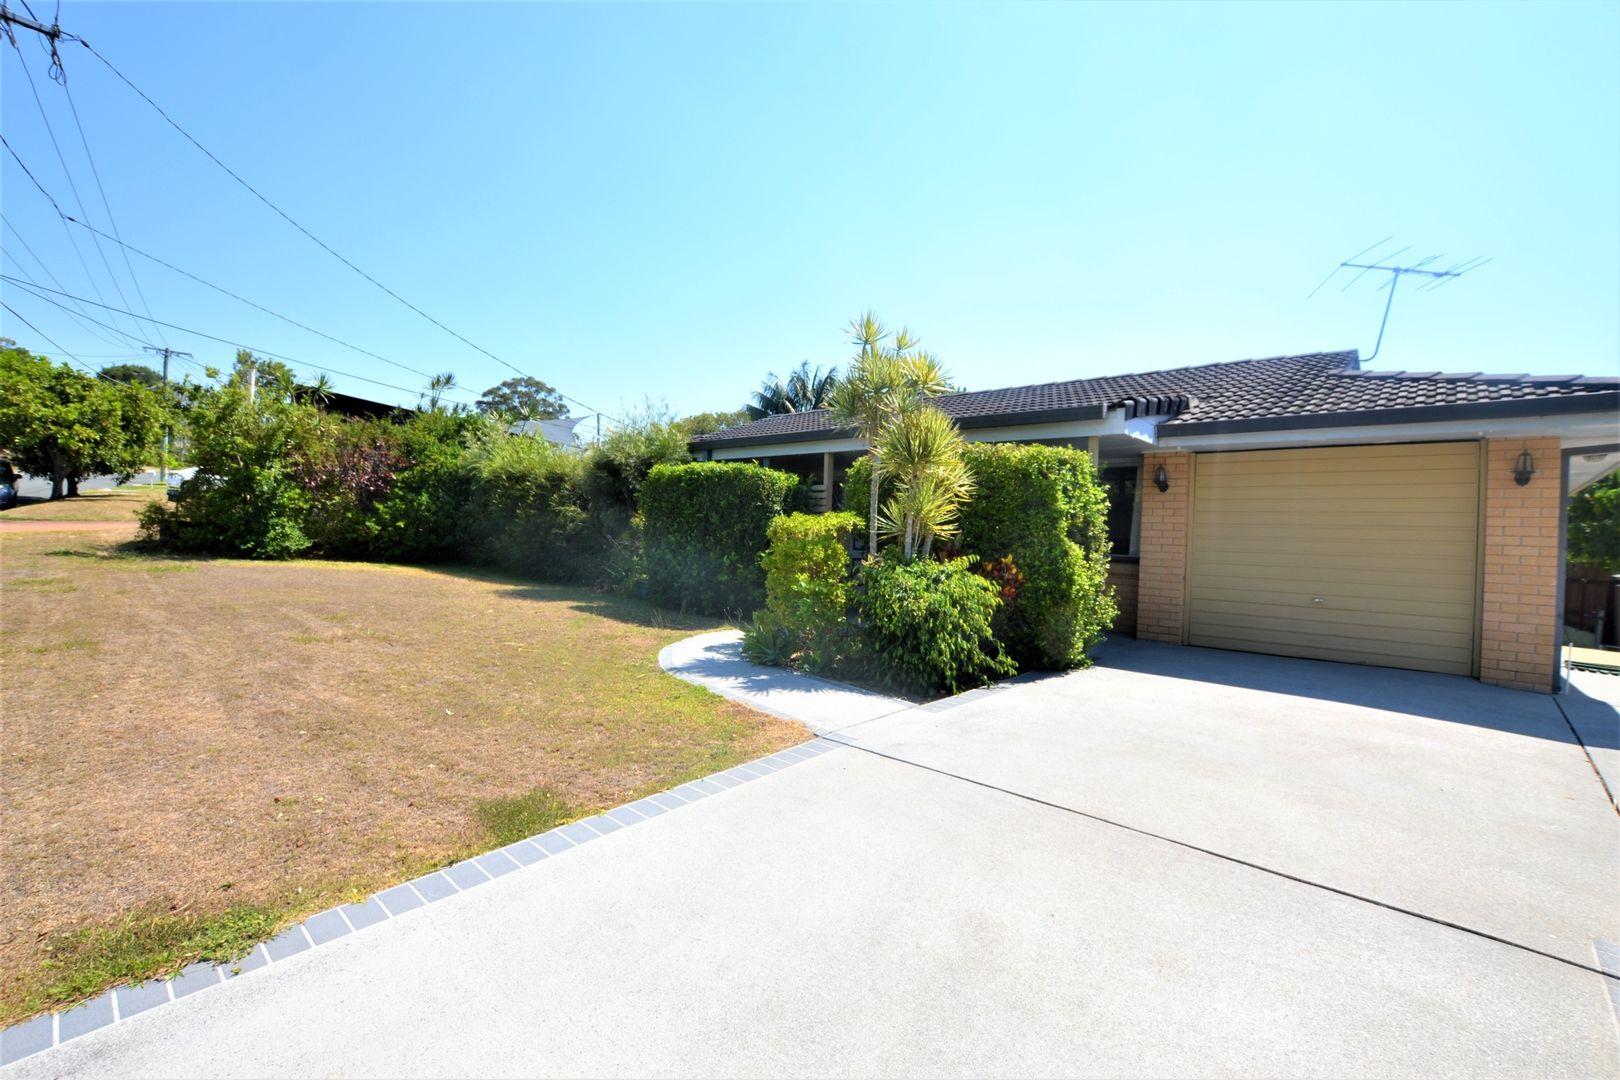 22 Whitfield Avenue, Springwood QLD 4127, Image 0